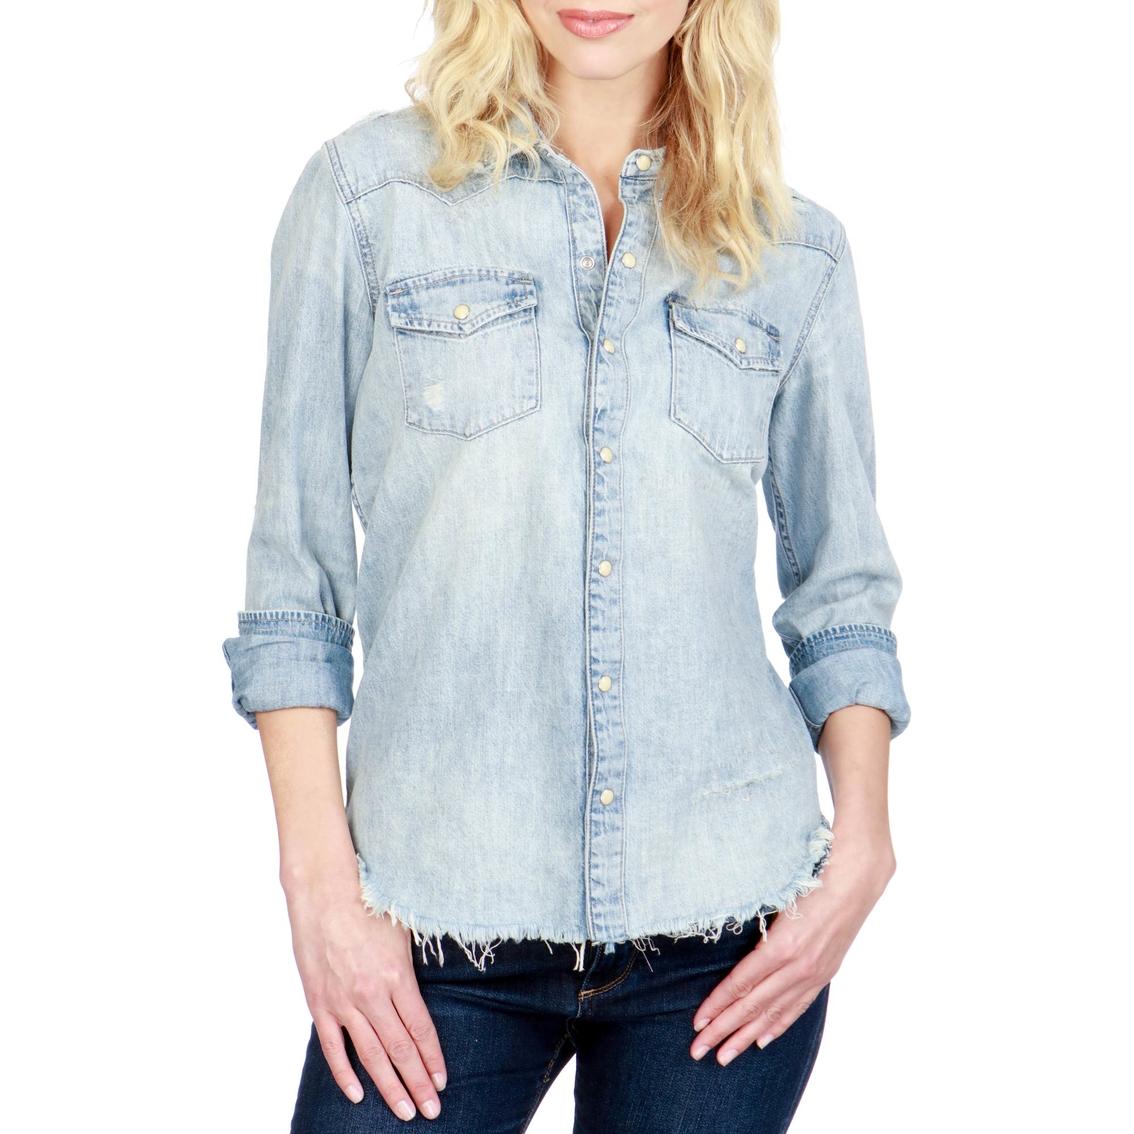 6739c067571e Lucky Brand Men Short Sleeve Santa Fe Western Shirt Red Blue Plaid Summer  8701072 KJYKEYP Source · Lucky Brand Classic Western Shirt Casual Shirts  Apparel ...